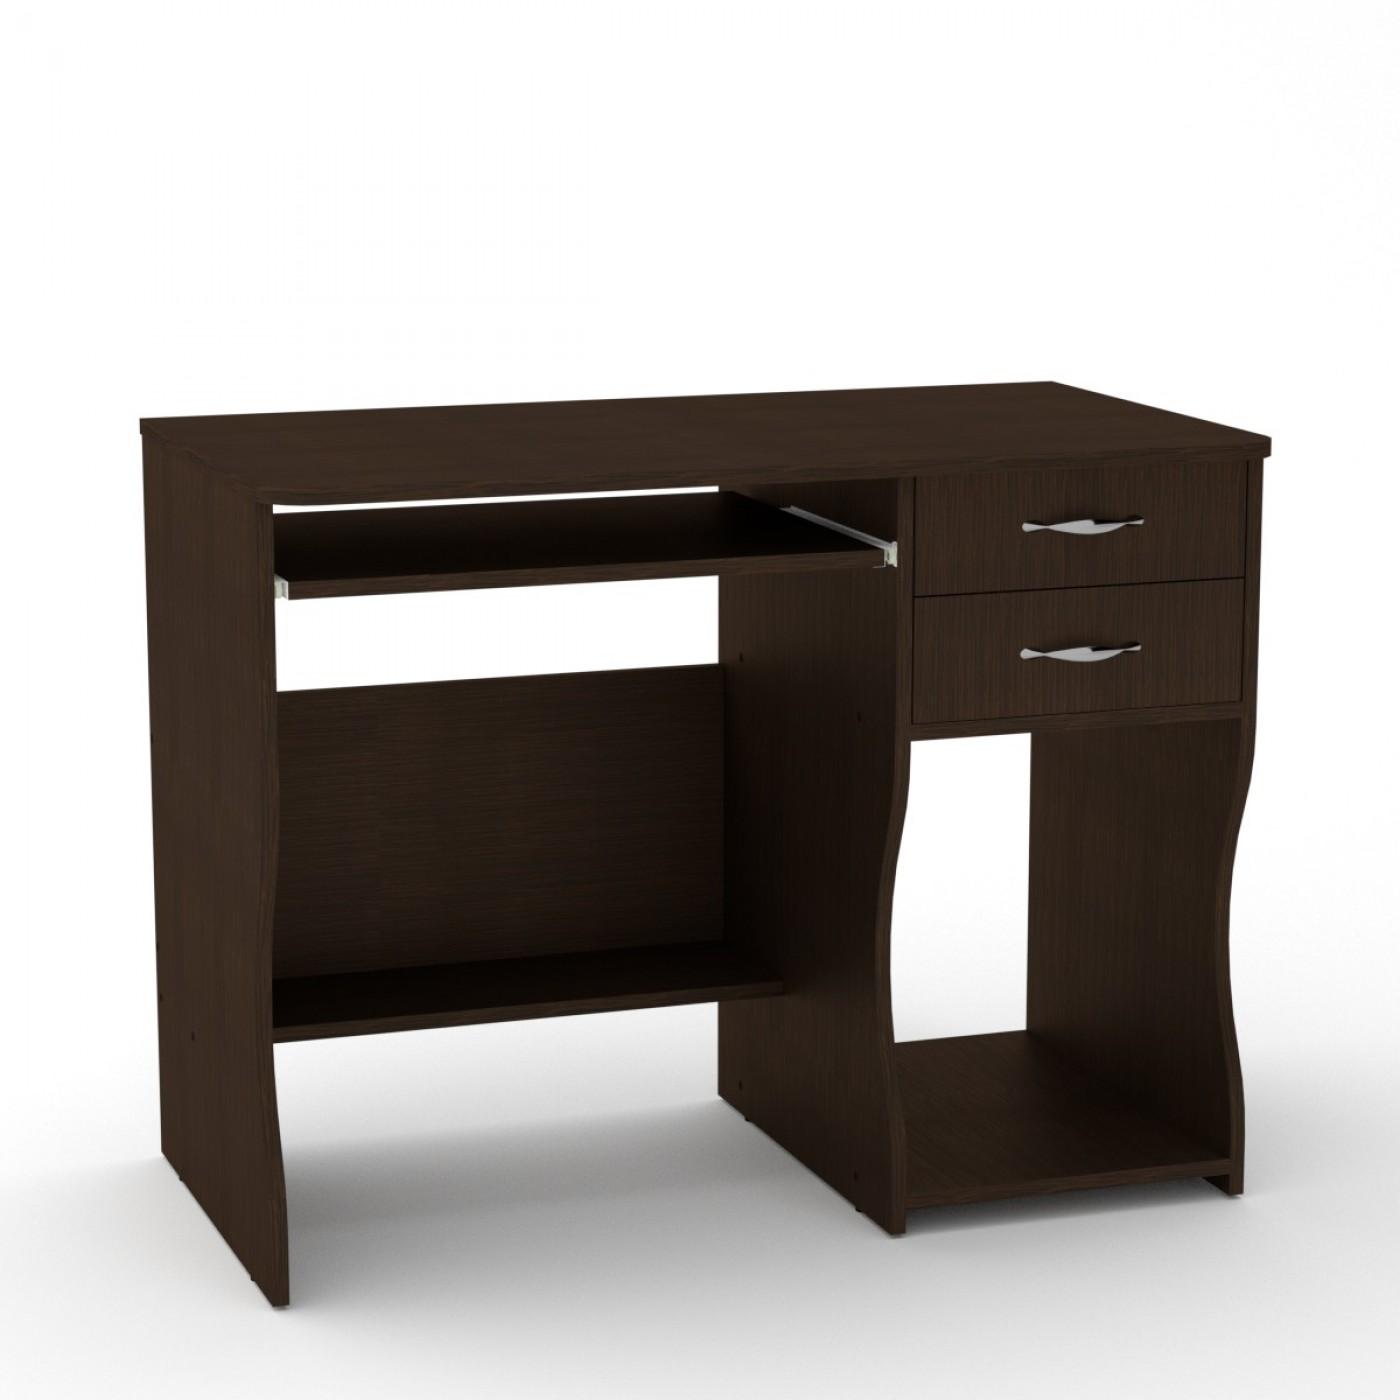 СКМ-7 стол компьютерный